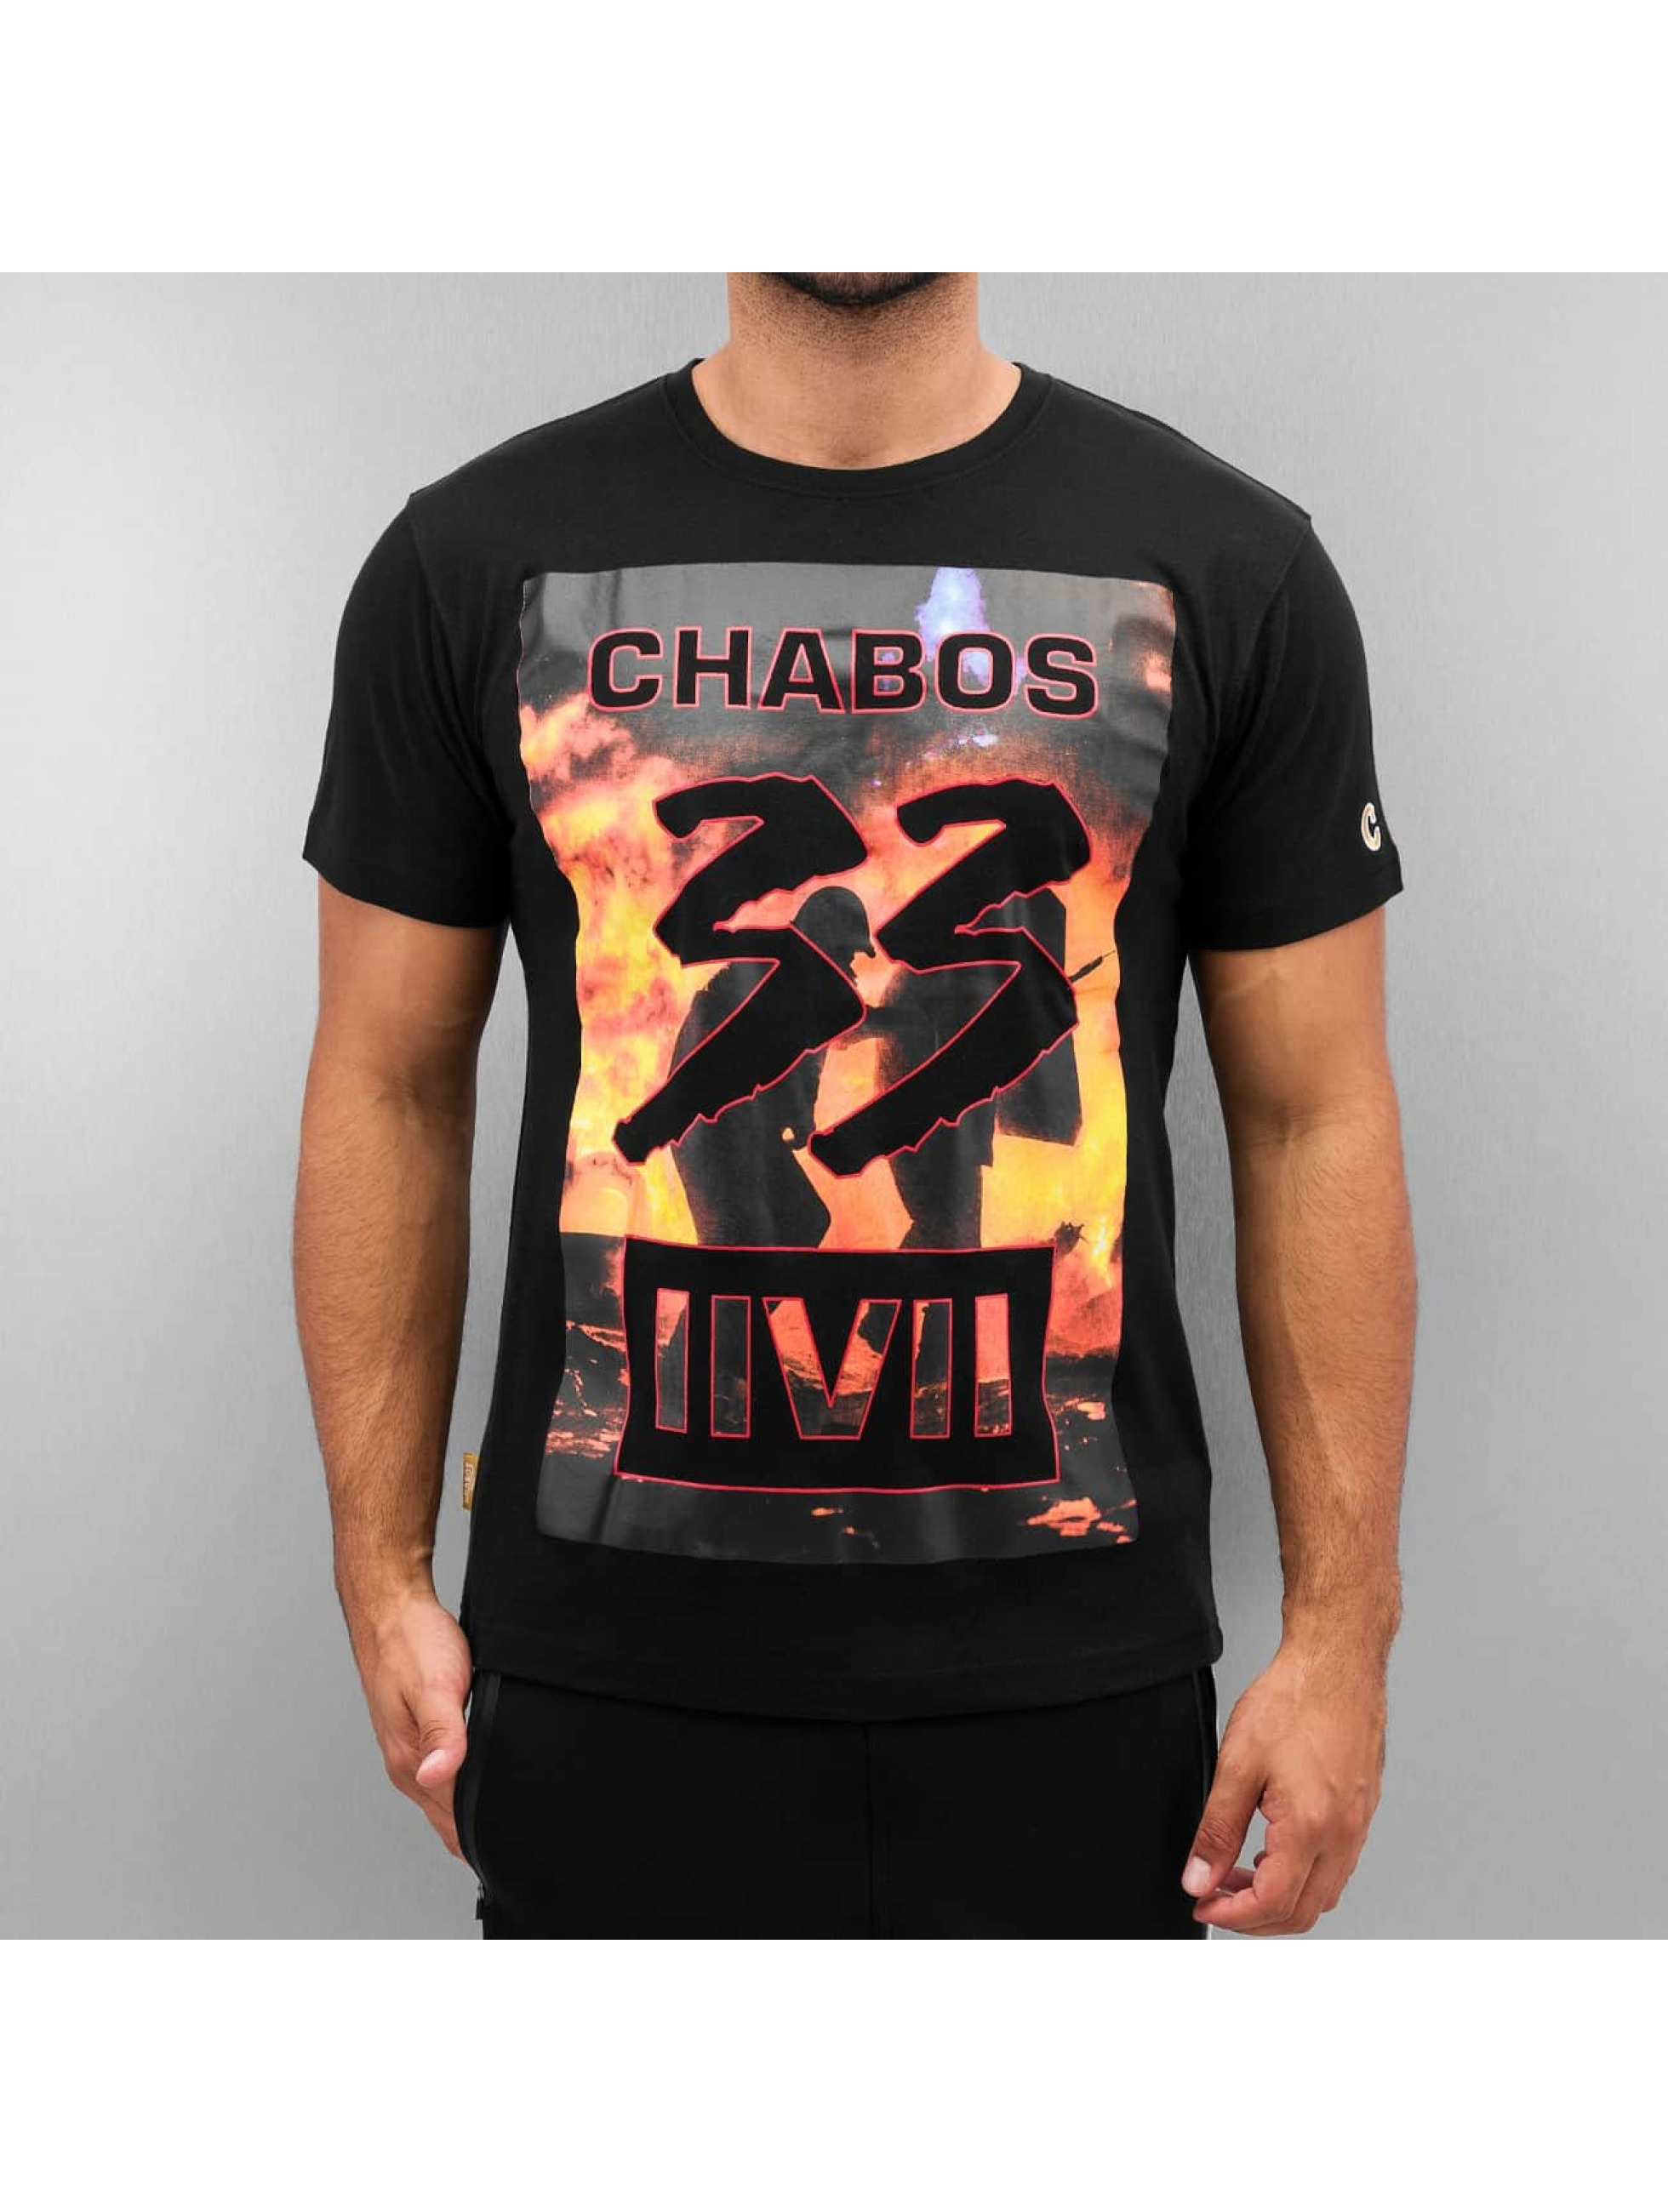 CHABOS IIVII t-shirt 33 zwart